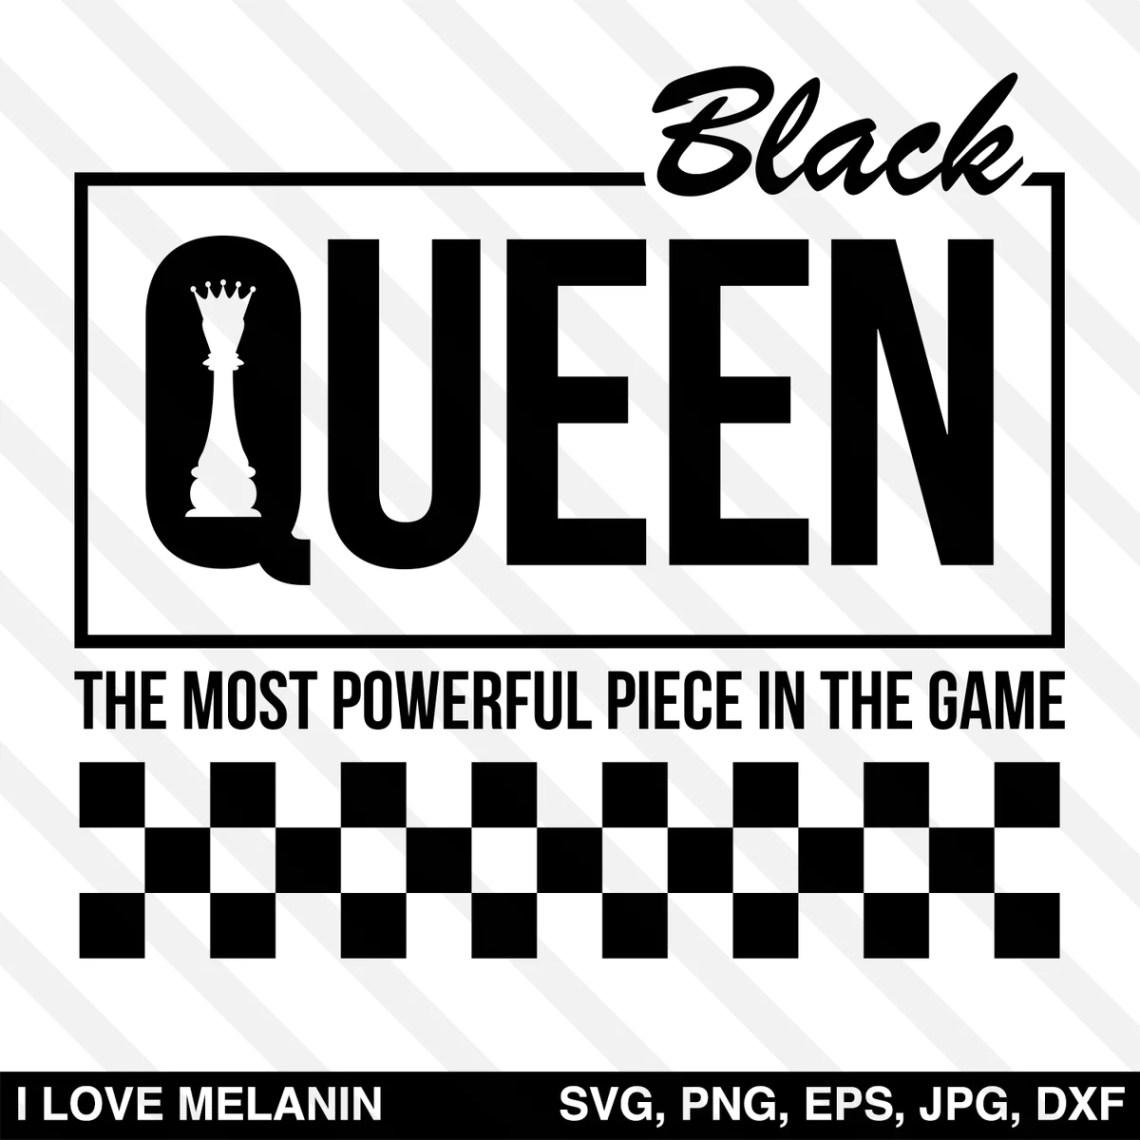 Download Black Queen Chess Checkered SVG - I Love Melanin